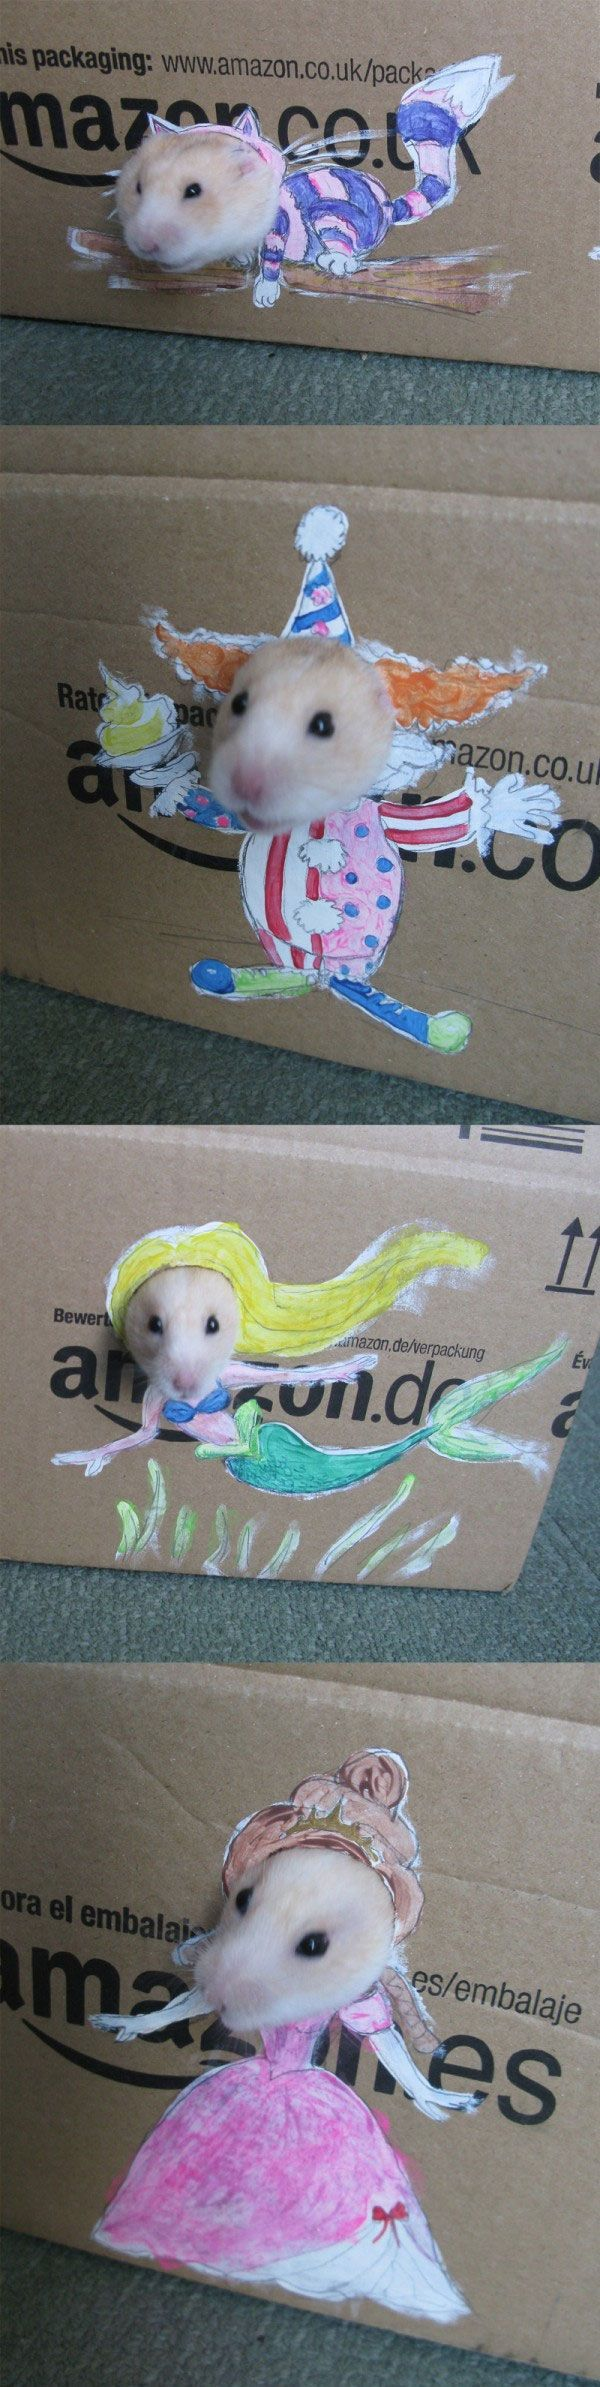 hamster-cardboard-box-costumes                                                                                                                                                                                 More